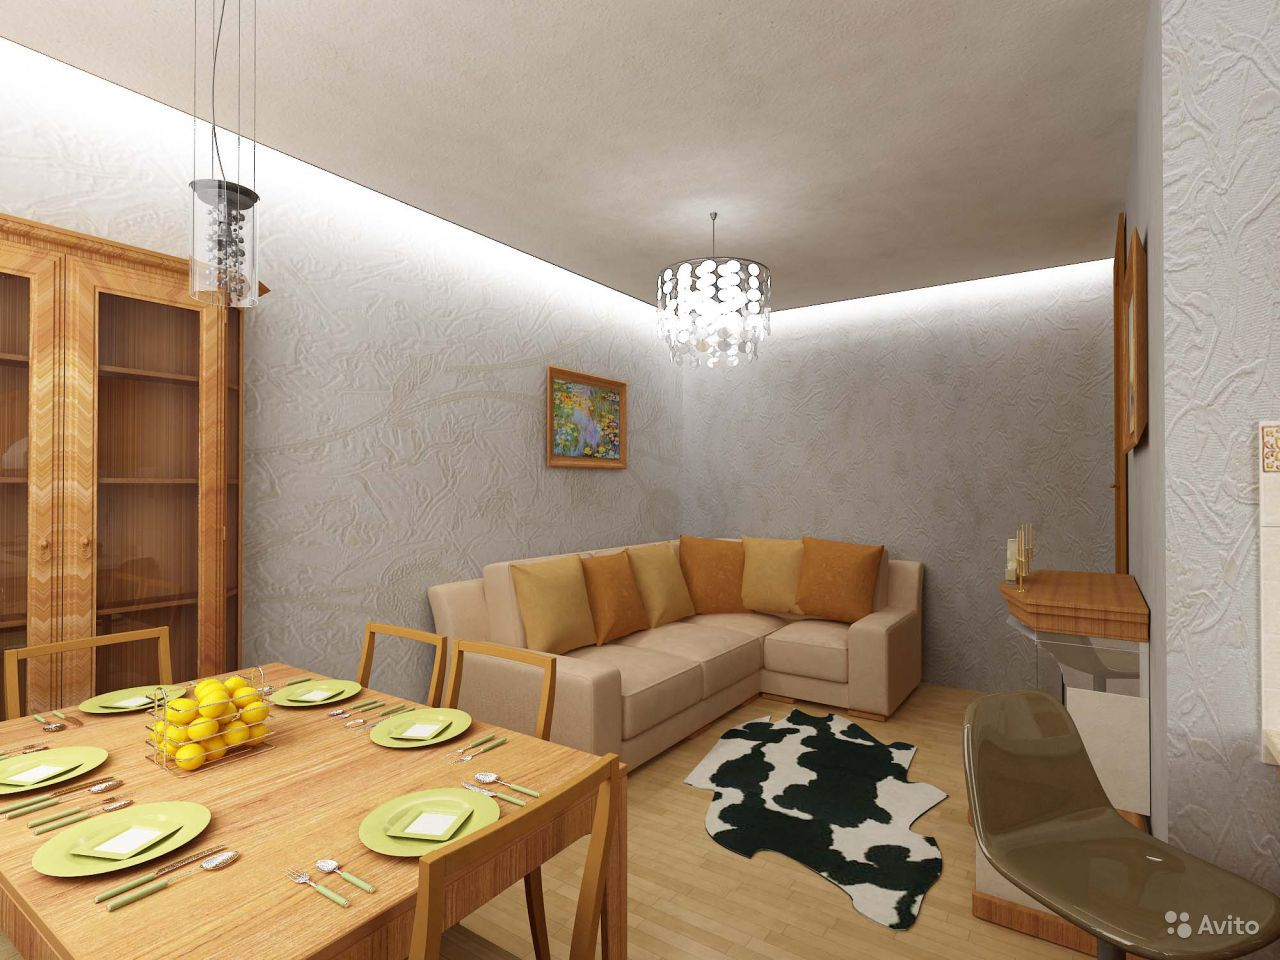 plafond gyproc bois troyes conseil travaux maconnerie soci t jeqc. Black Bedroom Furniture Sets. Home Design Ideas